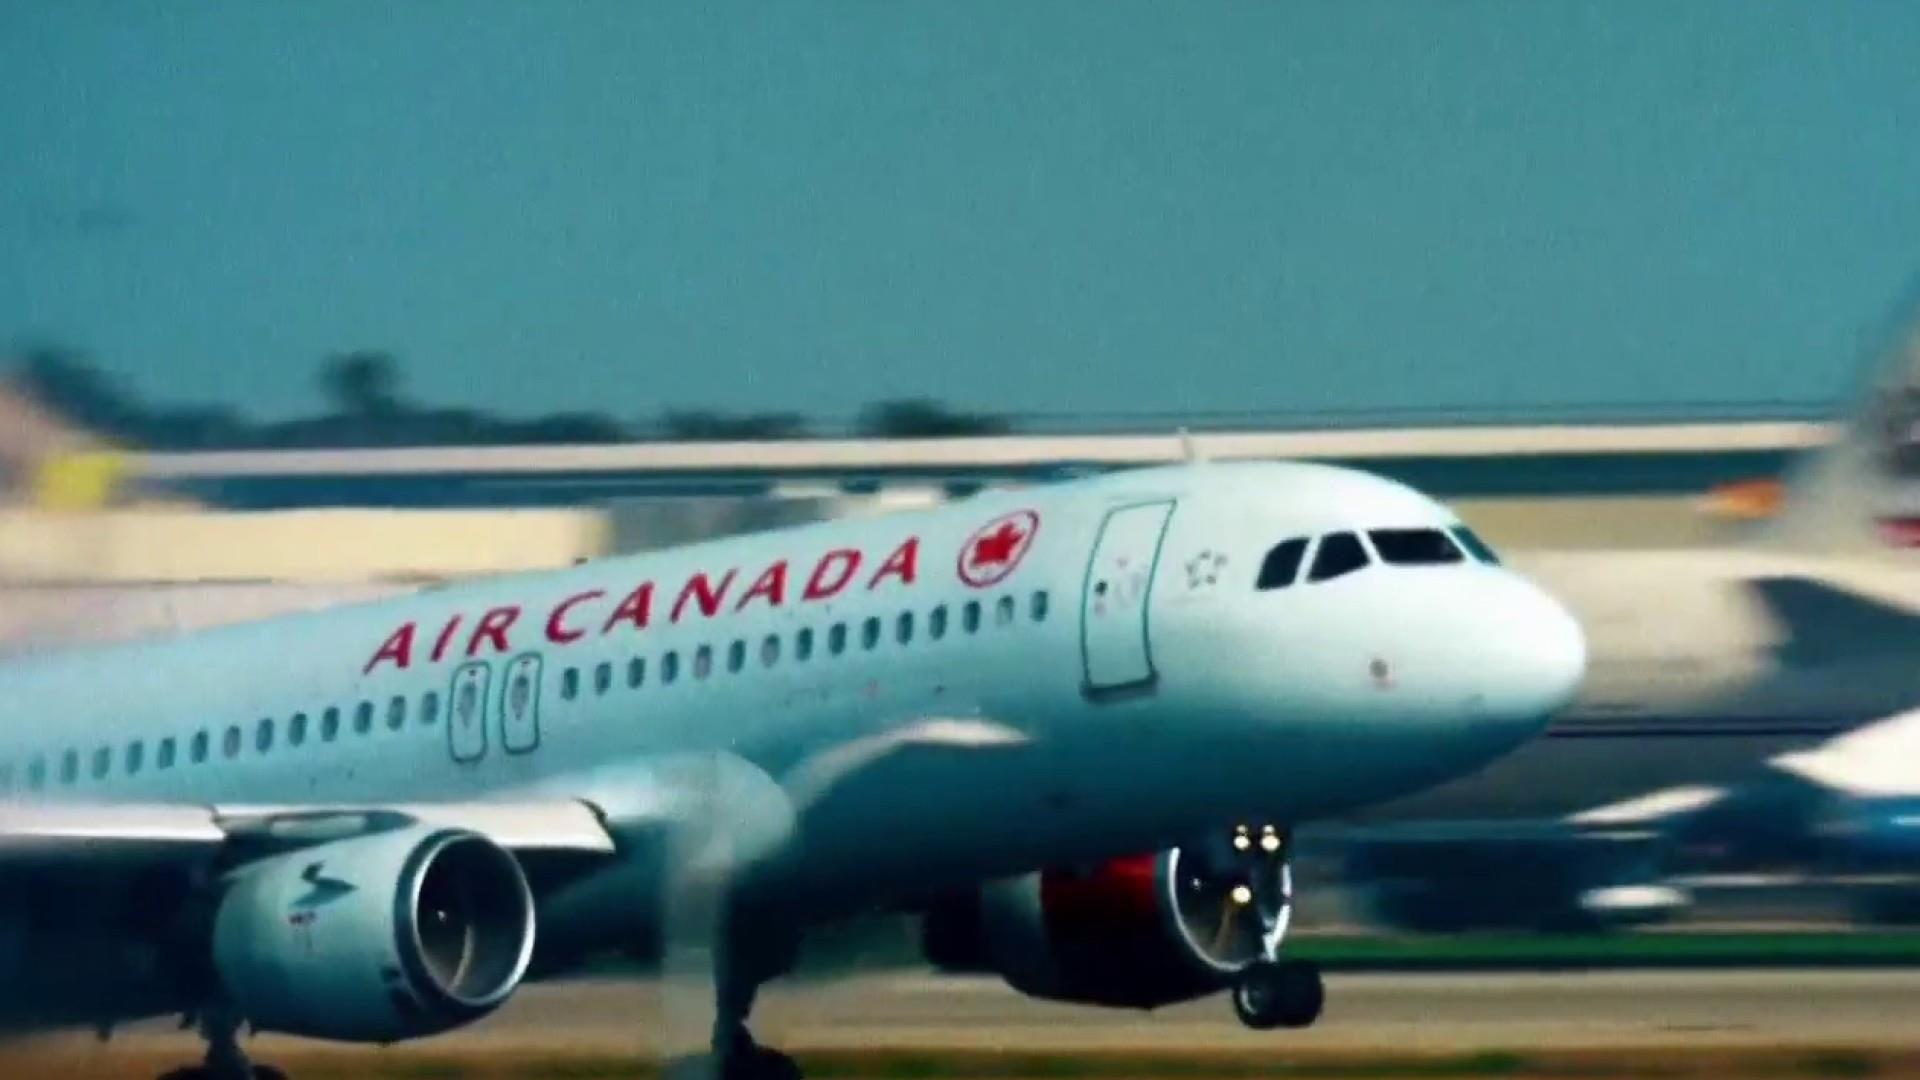 Severe turbulence injures almost three dozen on Air Canada flight